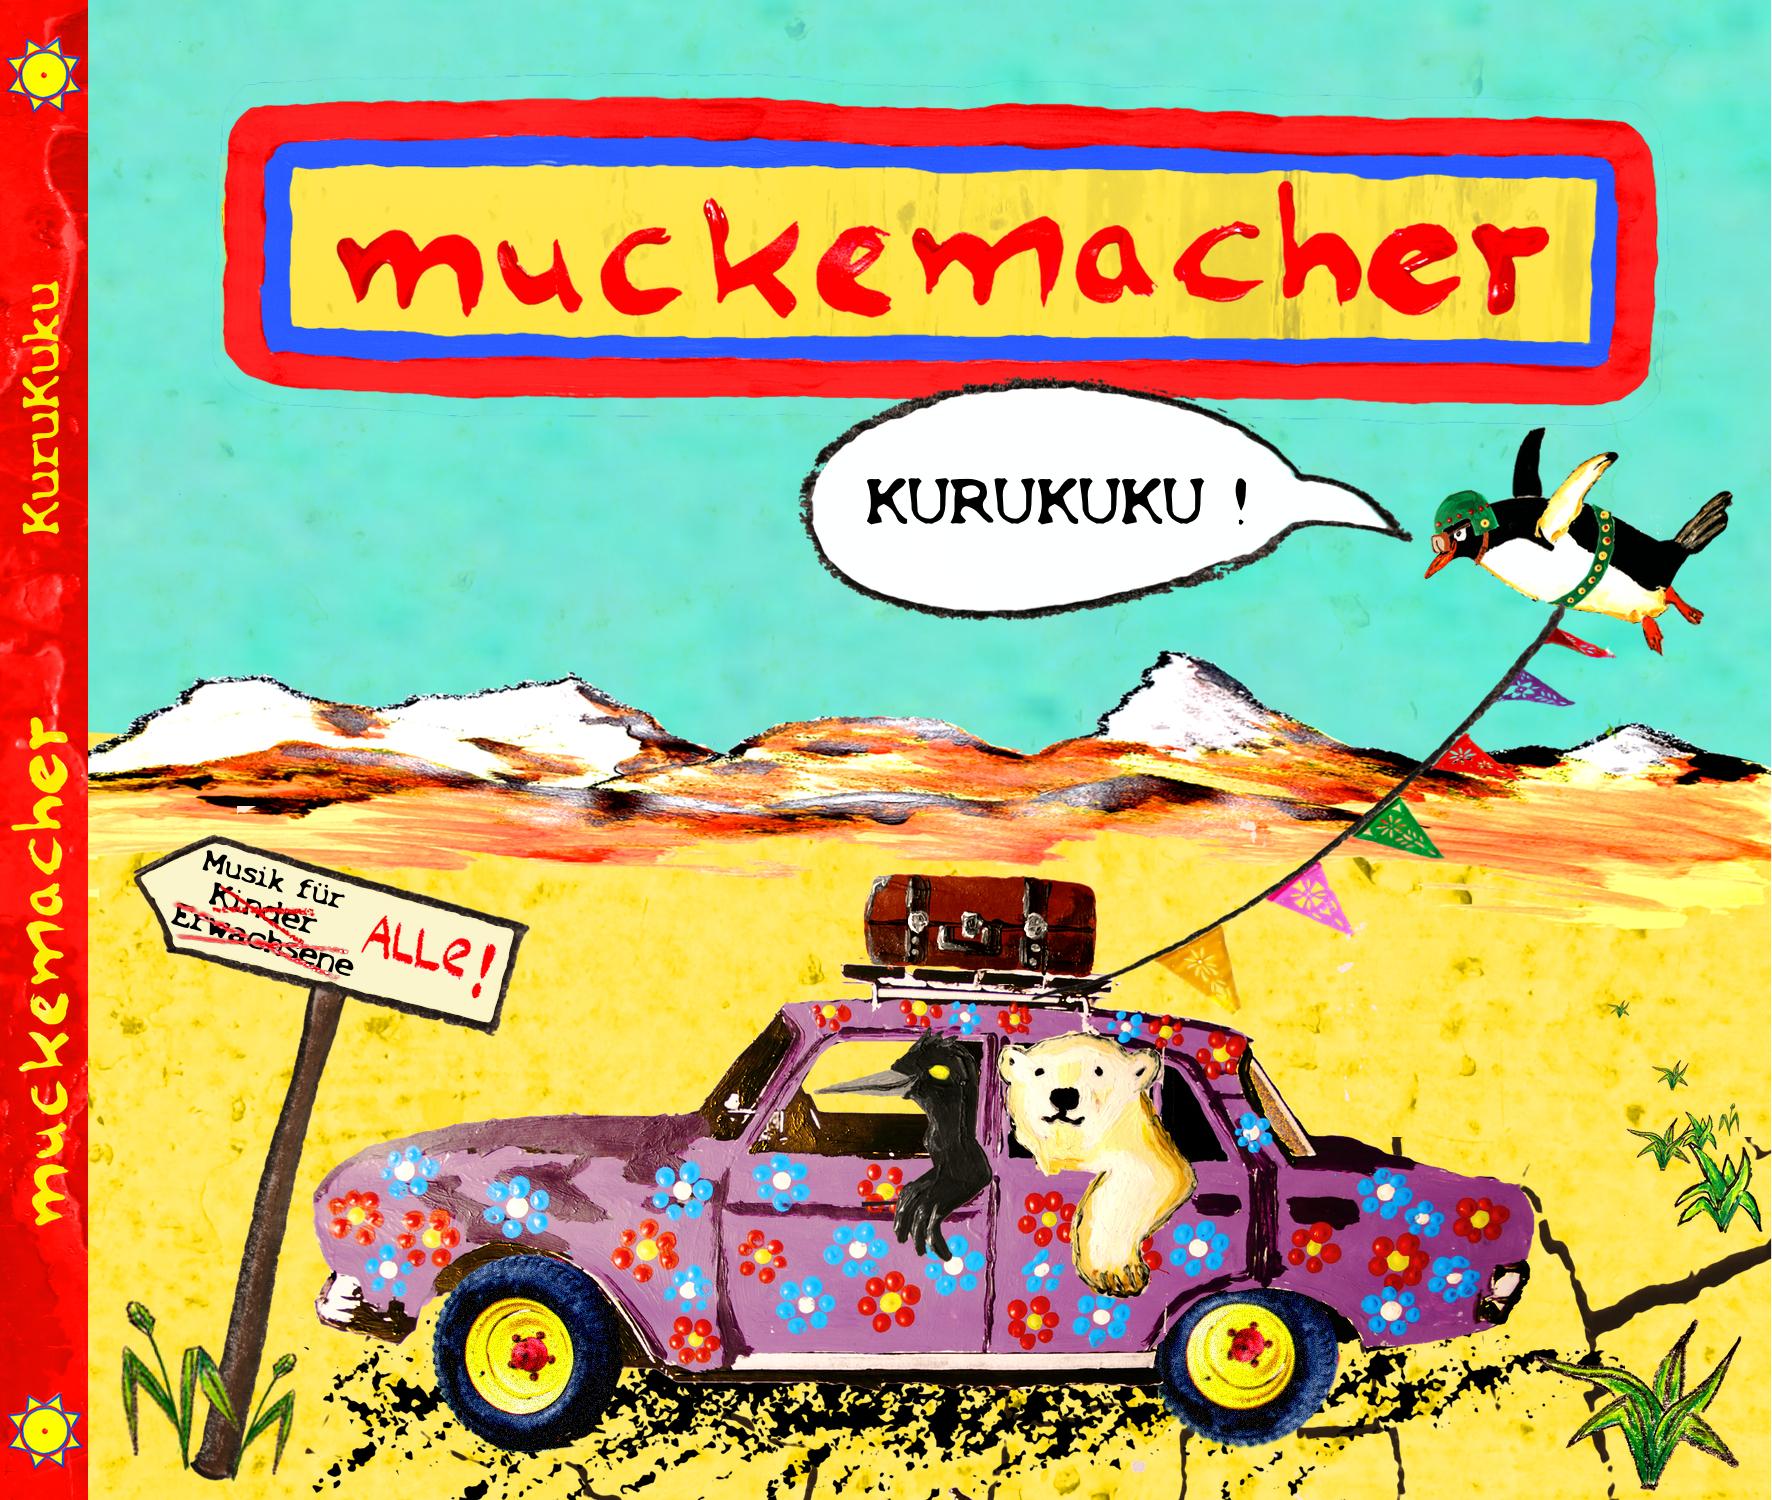 http://www.staygoldponygirl.de/wp-content/uploads/2016/06/Muckemacher_Kurukuku_Cover.jpg